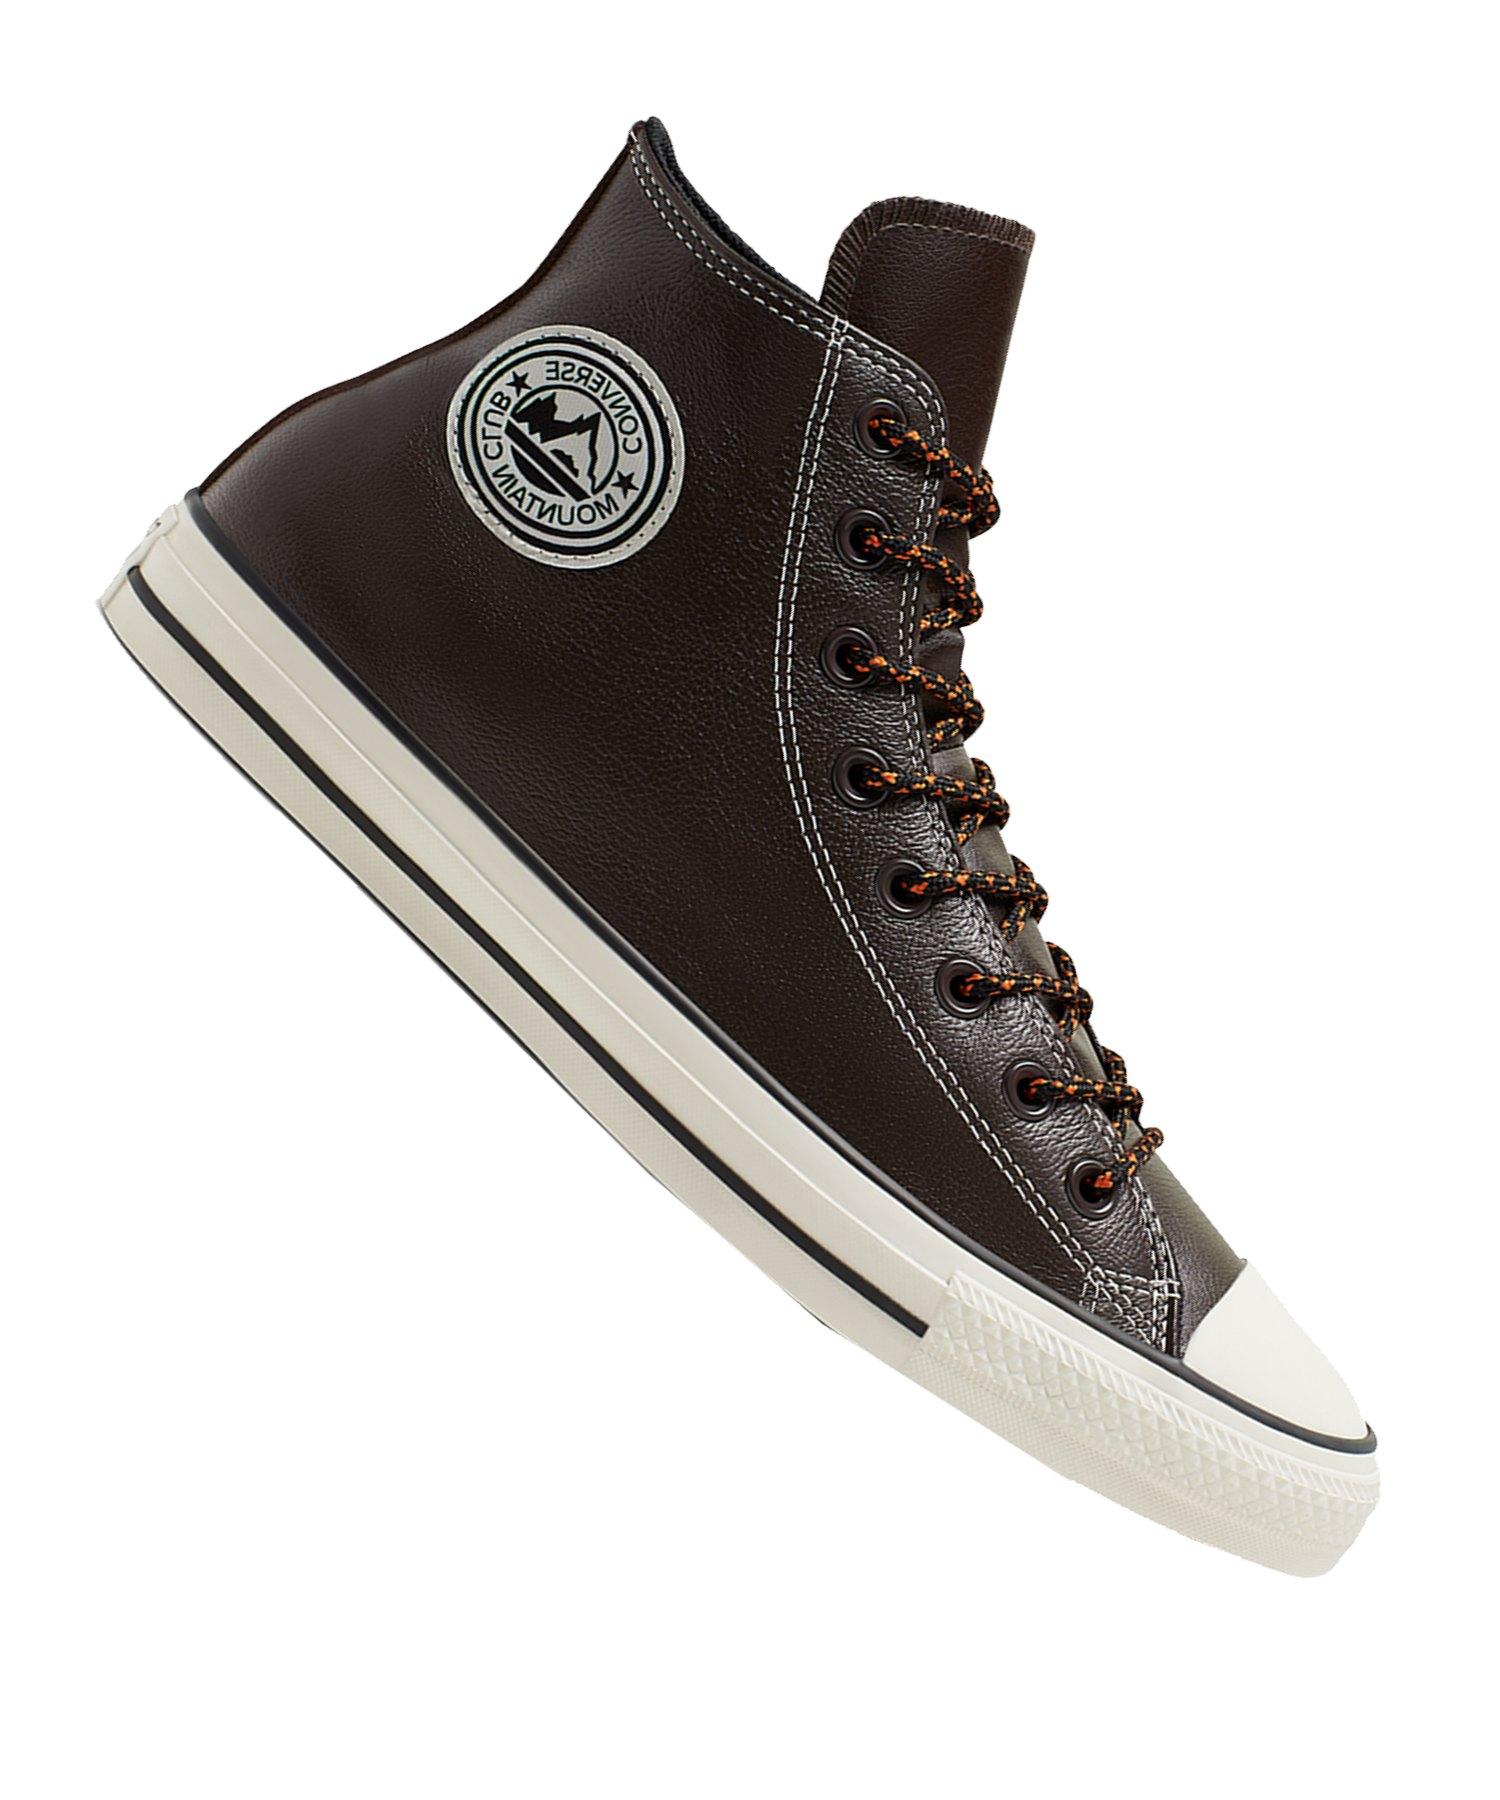 Converse Chuck Taylor AS High Sneaker Braun - braun